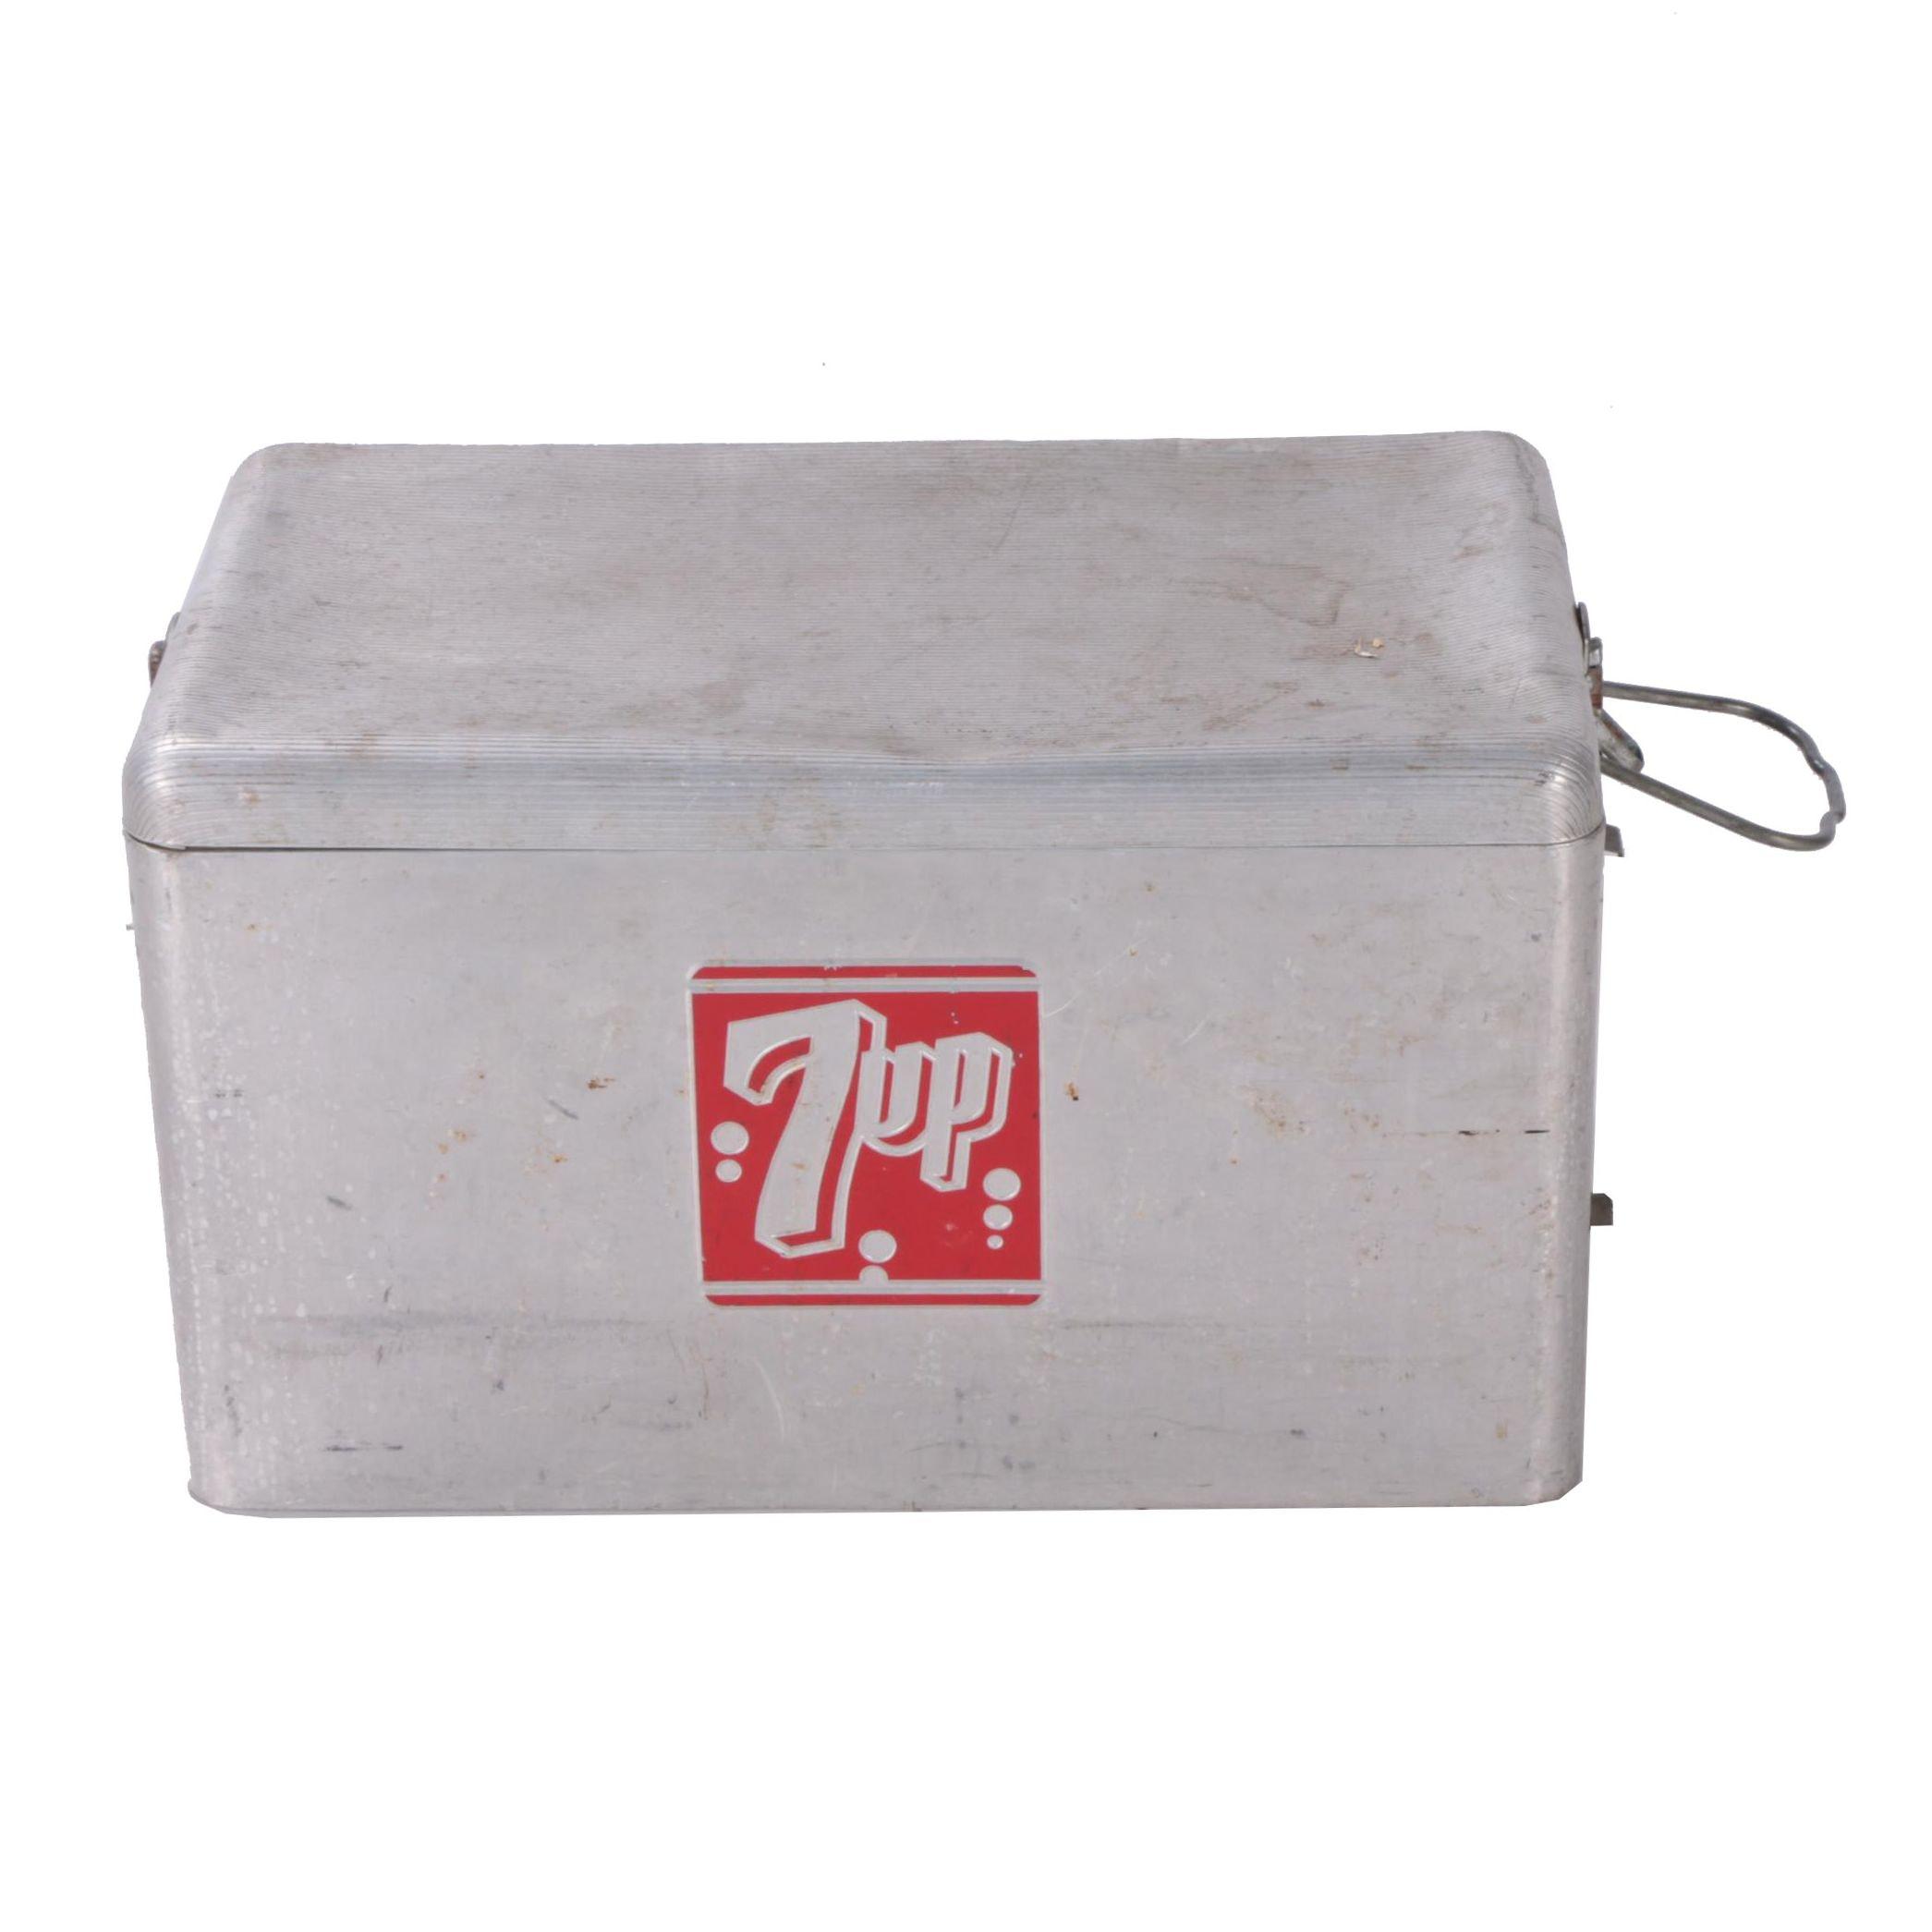 Metal 7-UP Cooler